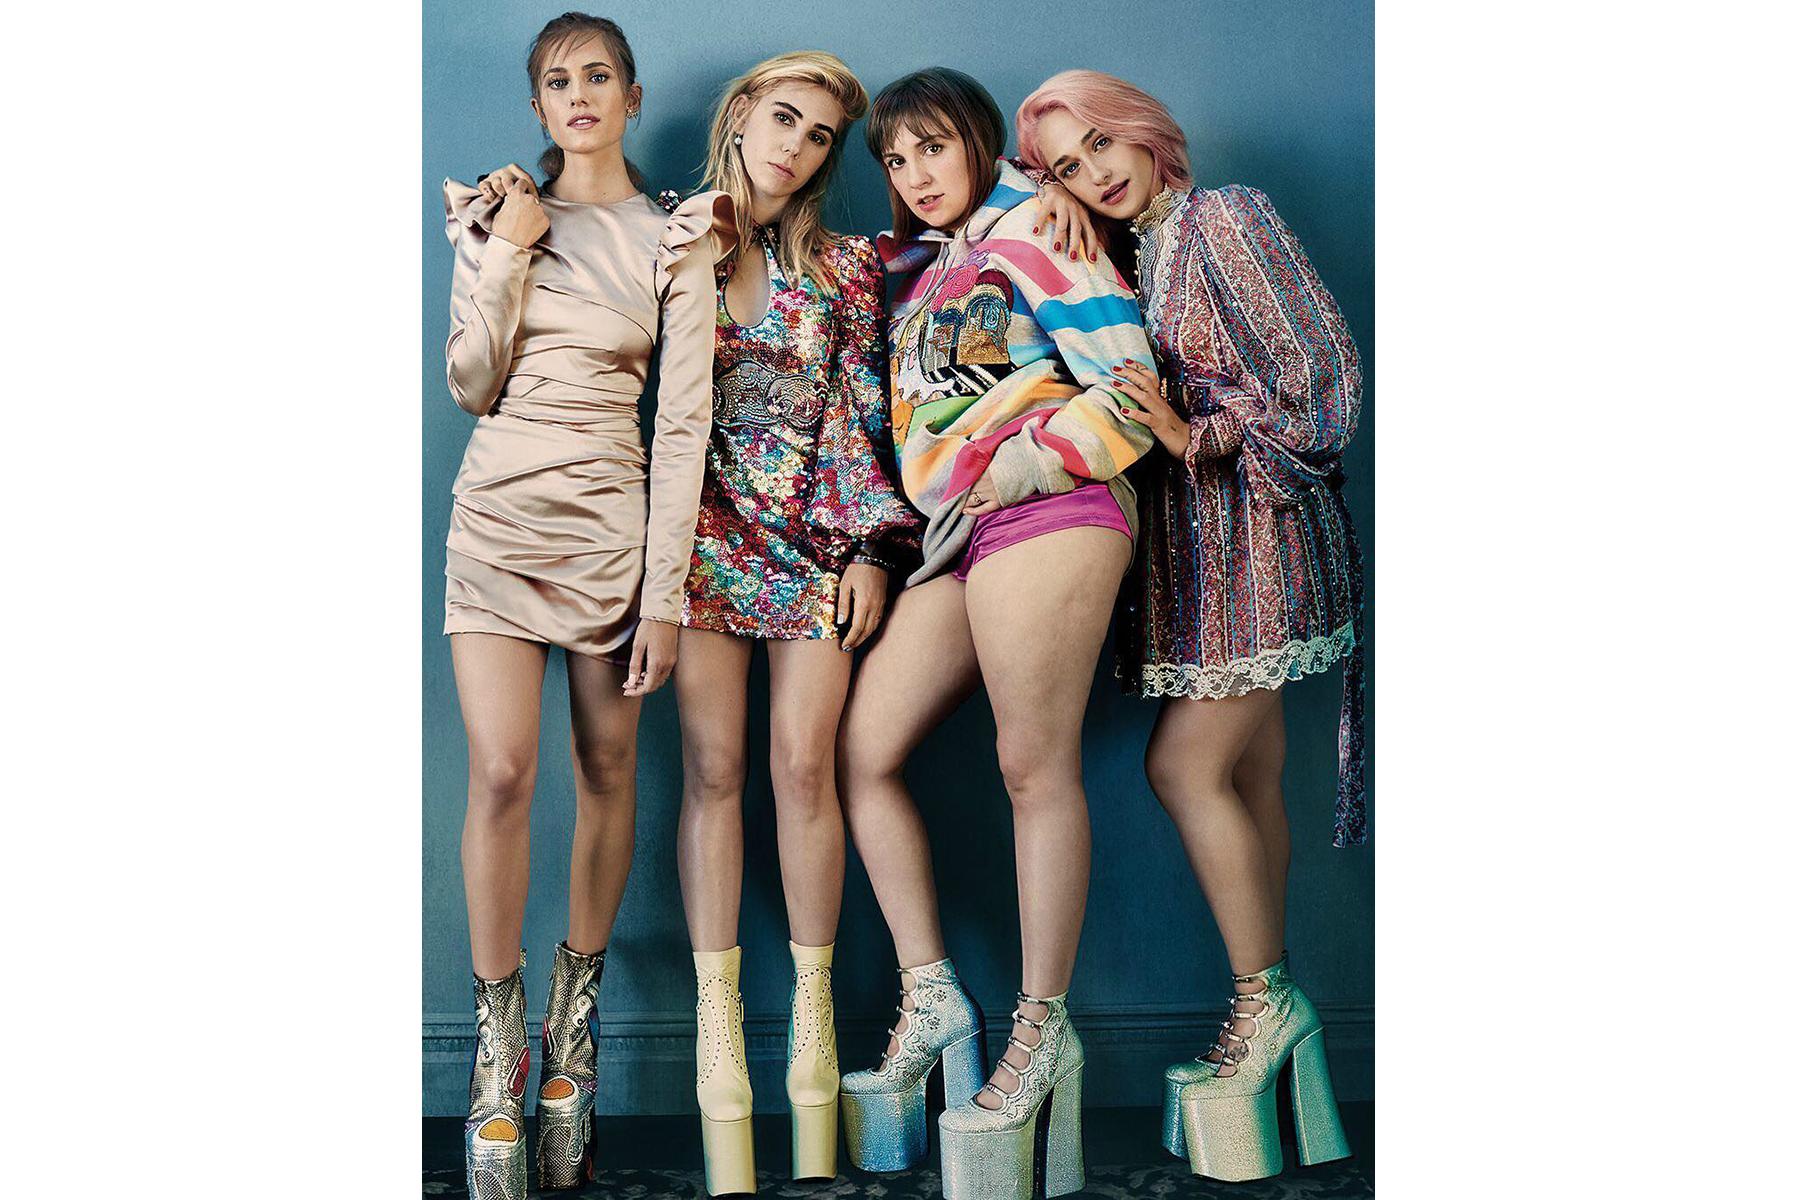 Lena Dunham and 'Girls' Cast on 'Glamour' 2017 February ...